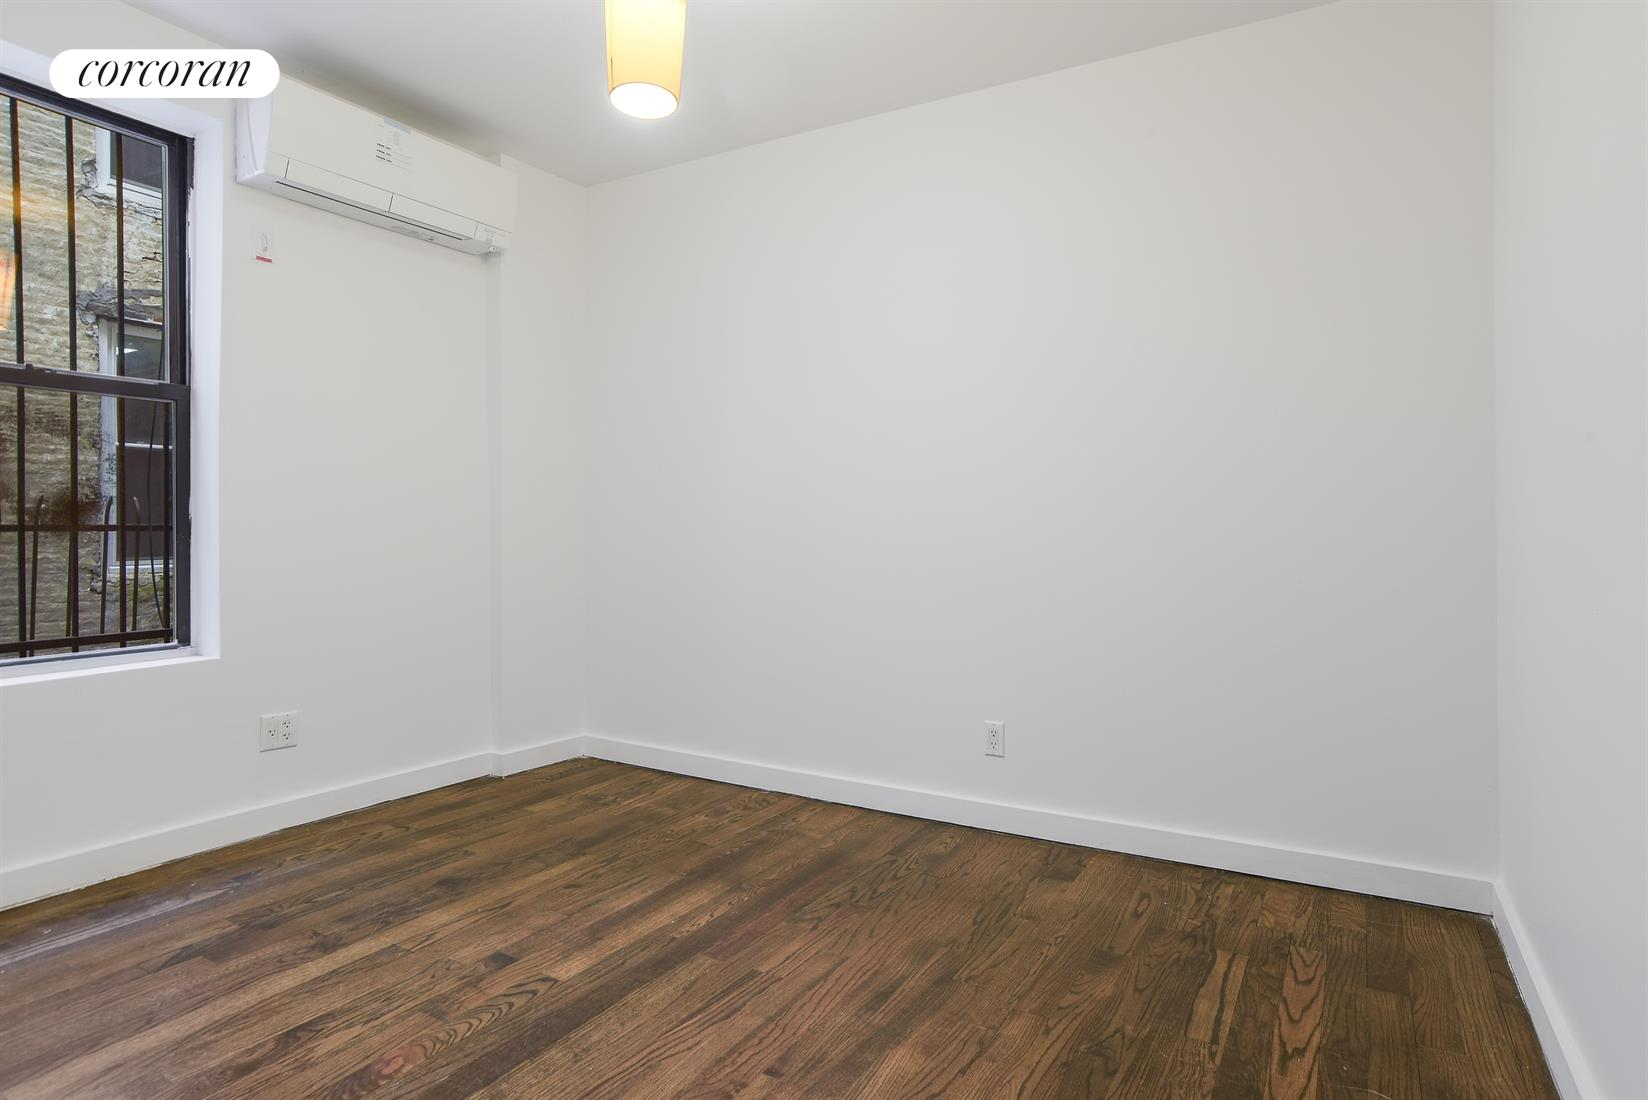 Corcoran, 1500 Bushwick Avenue, Apt. 1L, Bushwick Rentals, Brooklyn ...